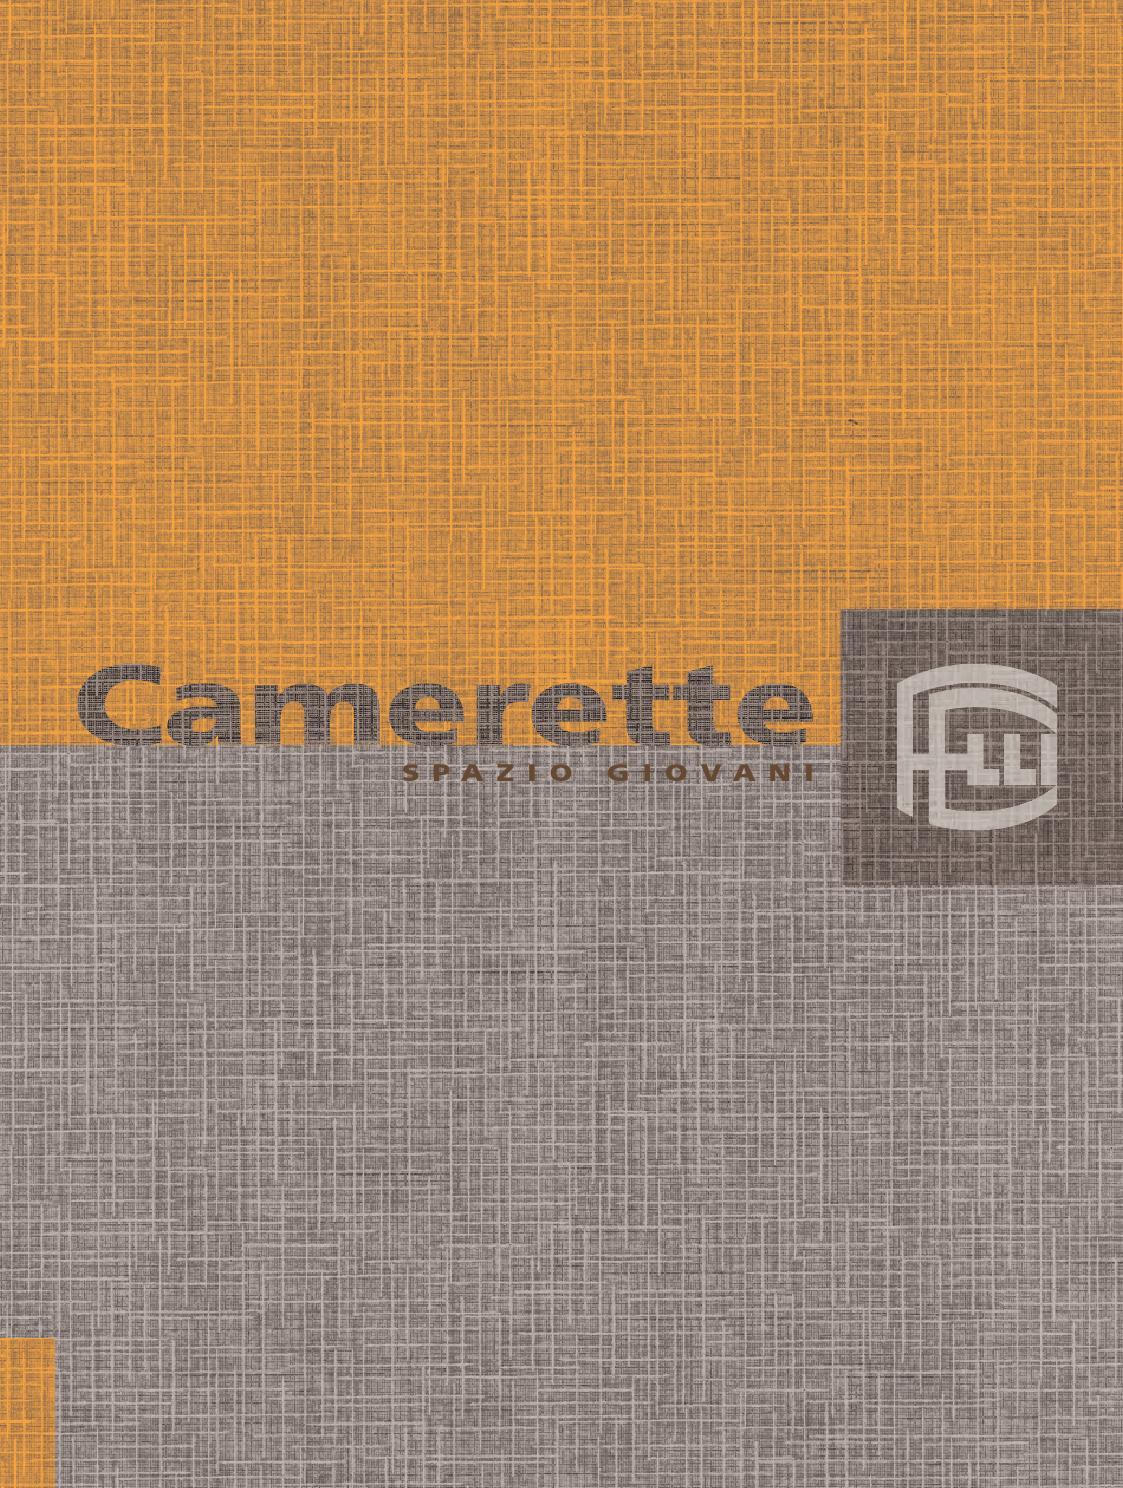 Camerette s75 vol. 1 by gruppo casa mia   issuu